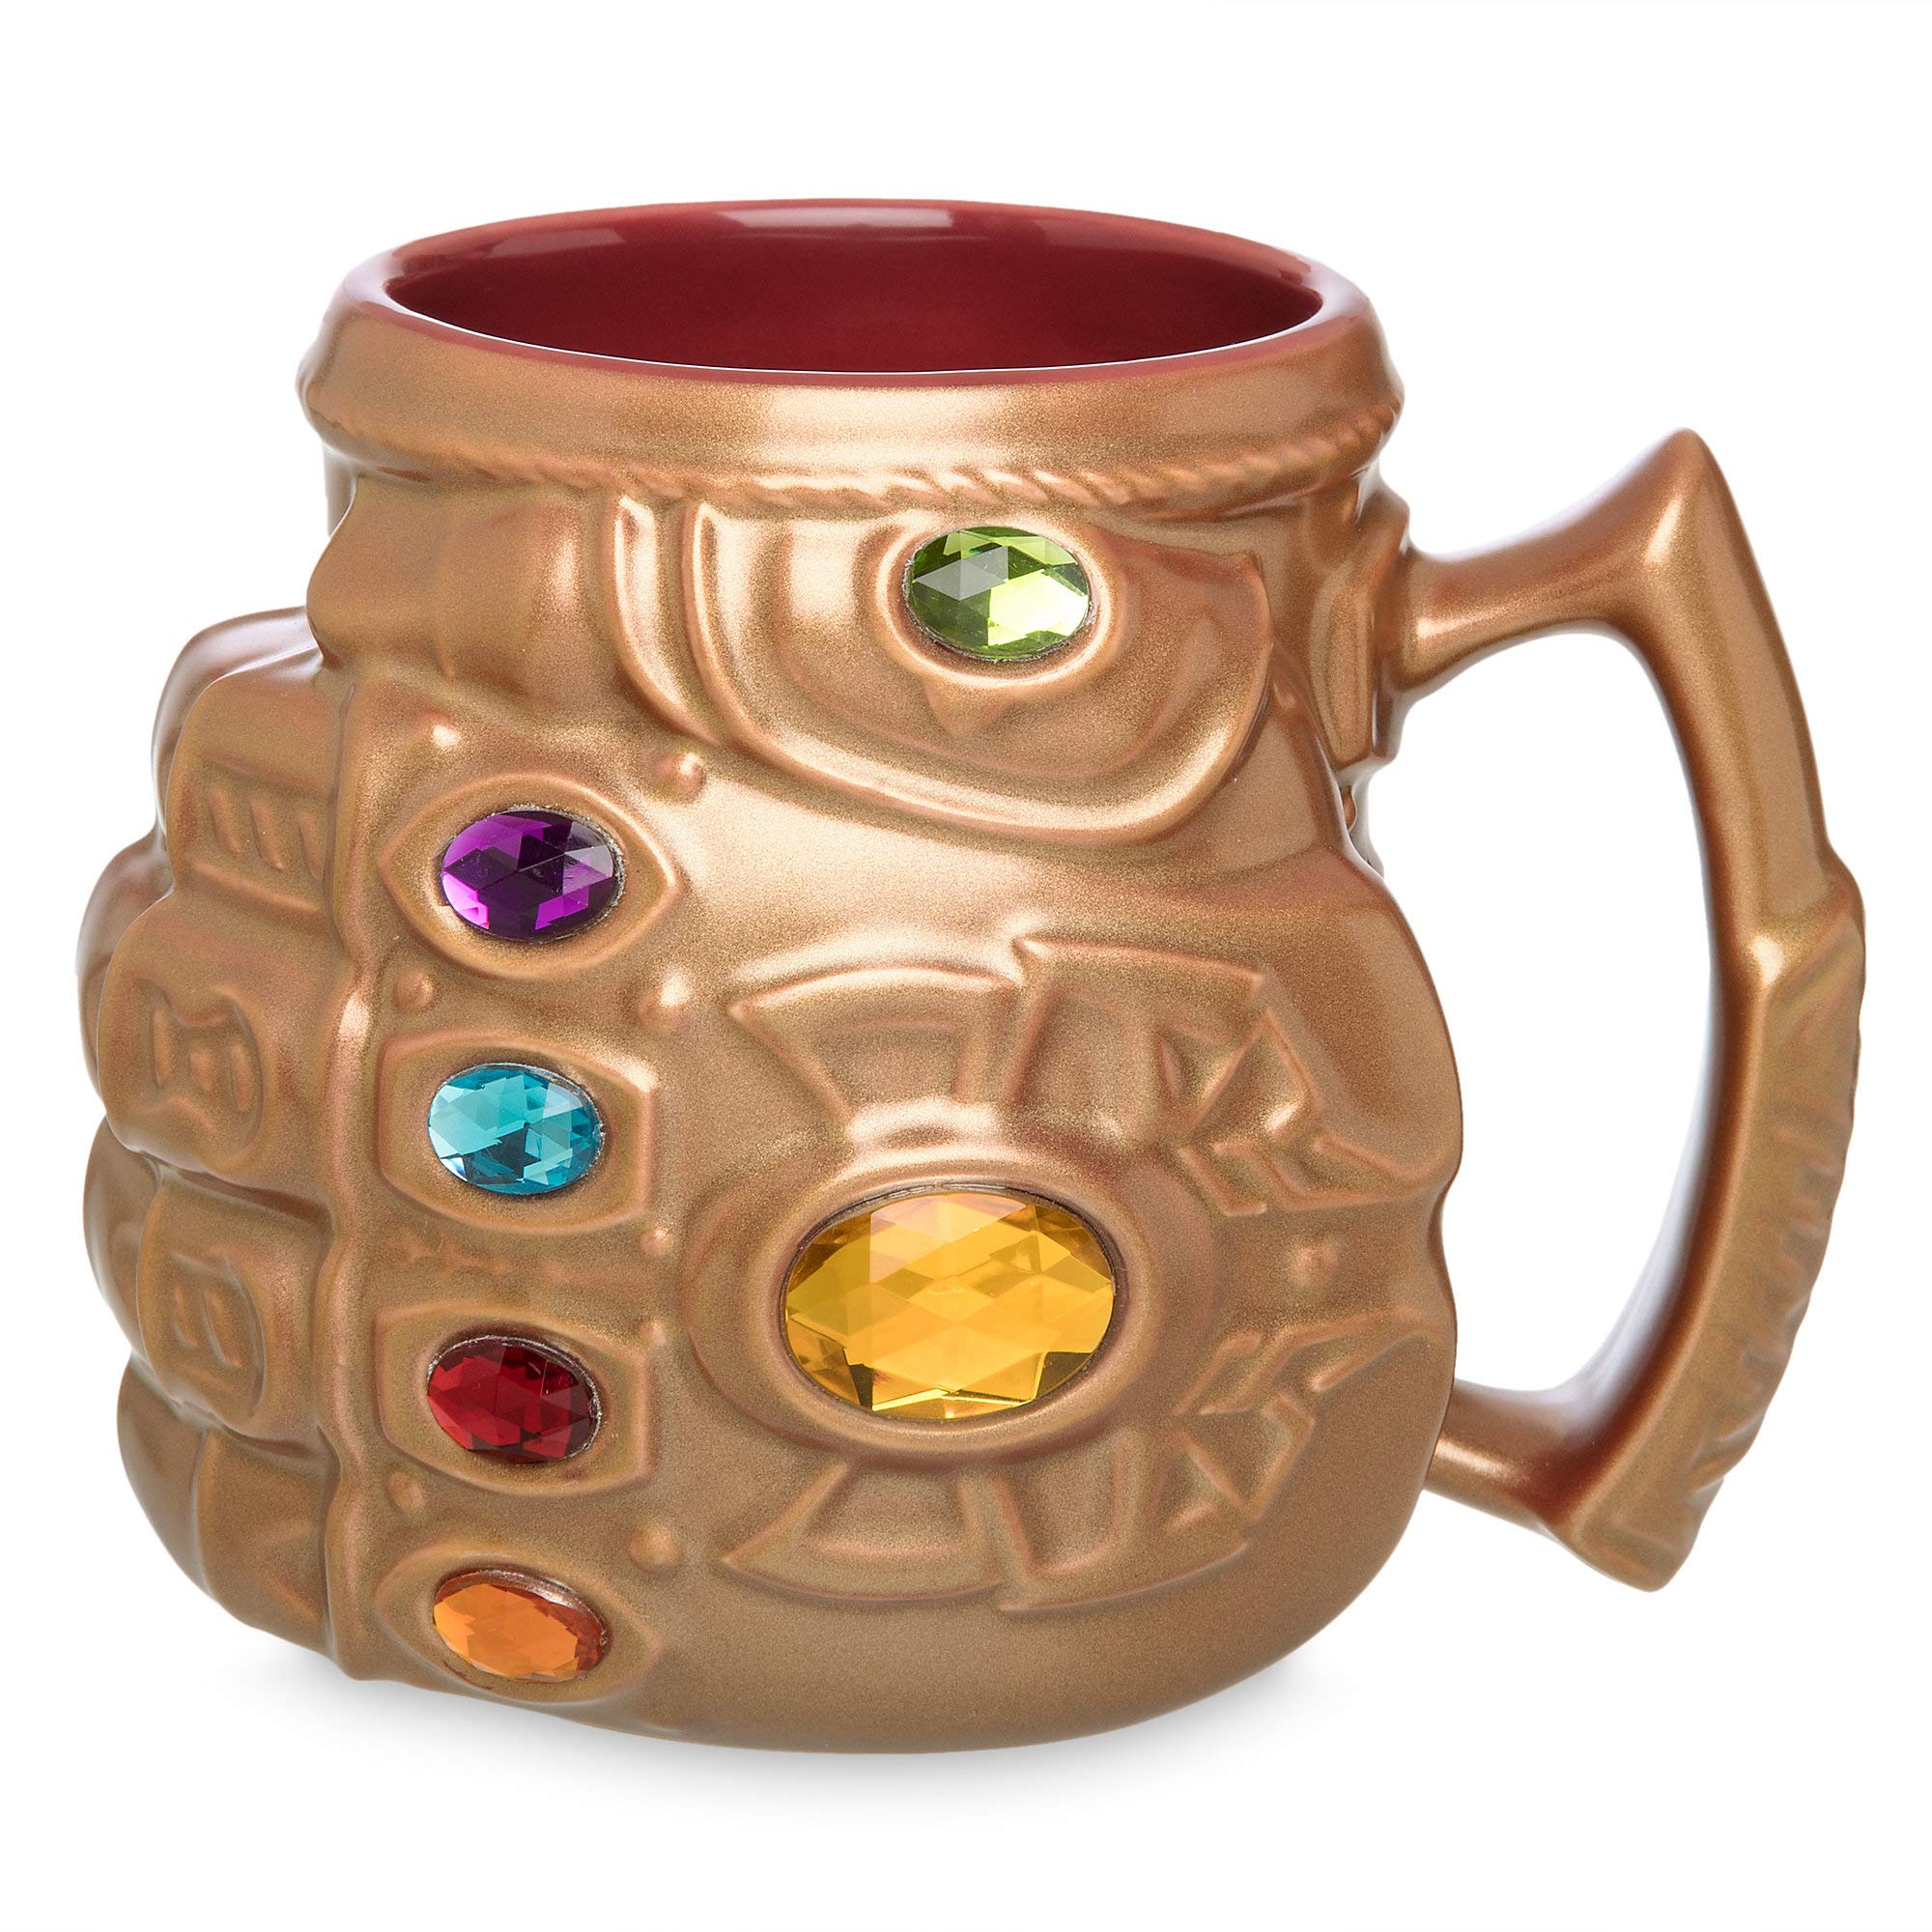 Marvel Thanos Infinity Gauntlet Mug - Marvel's Avengers: Infinity War by Marvel (Image #1)